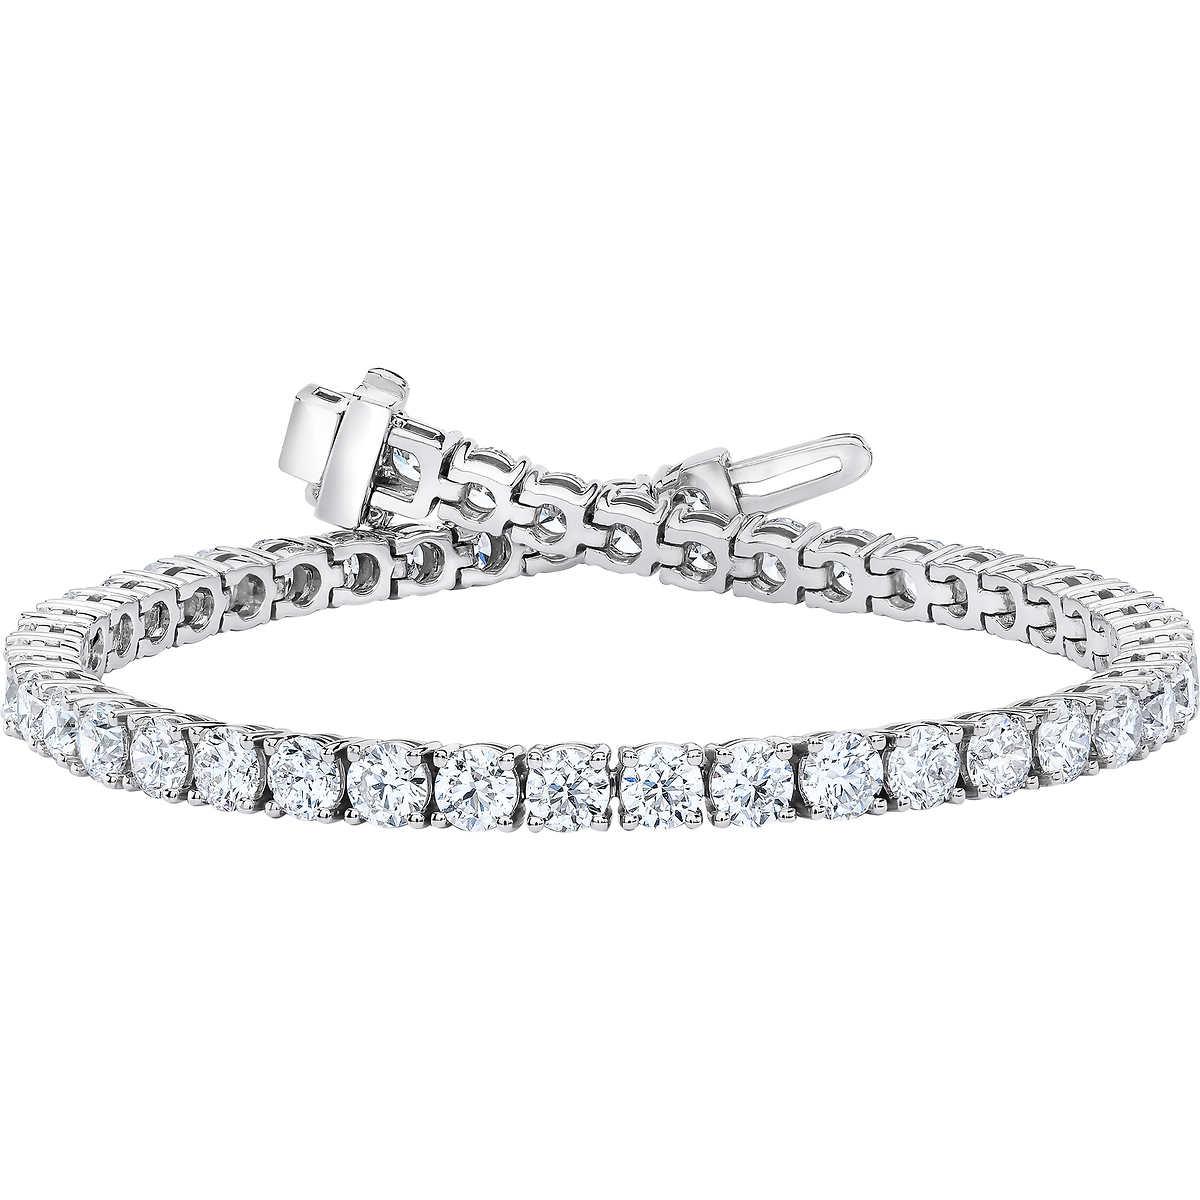 50fceb852 ... Round Brilliant 8.00 ctw VS2 Clarity, I Color Diamond 14kt White Gold  Bracelet. 1 1